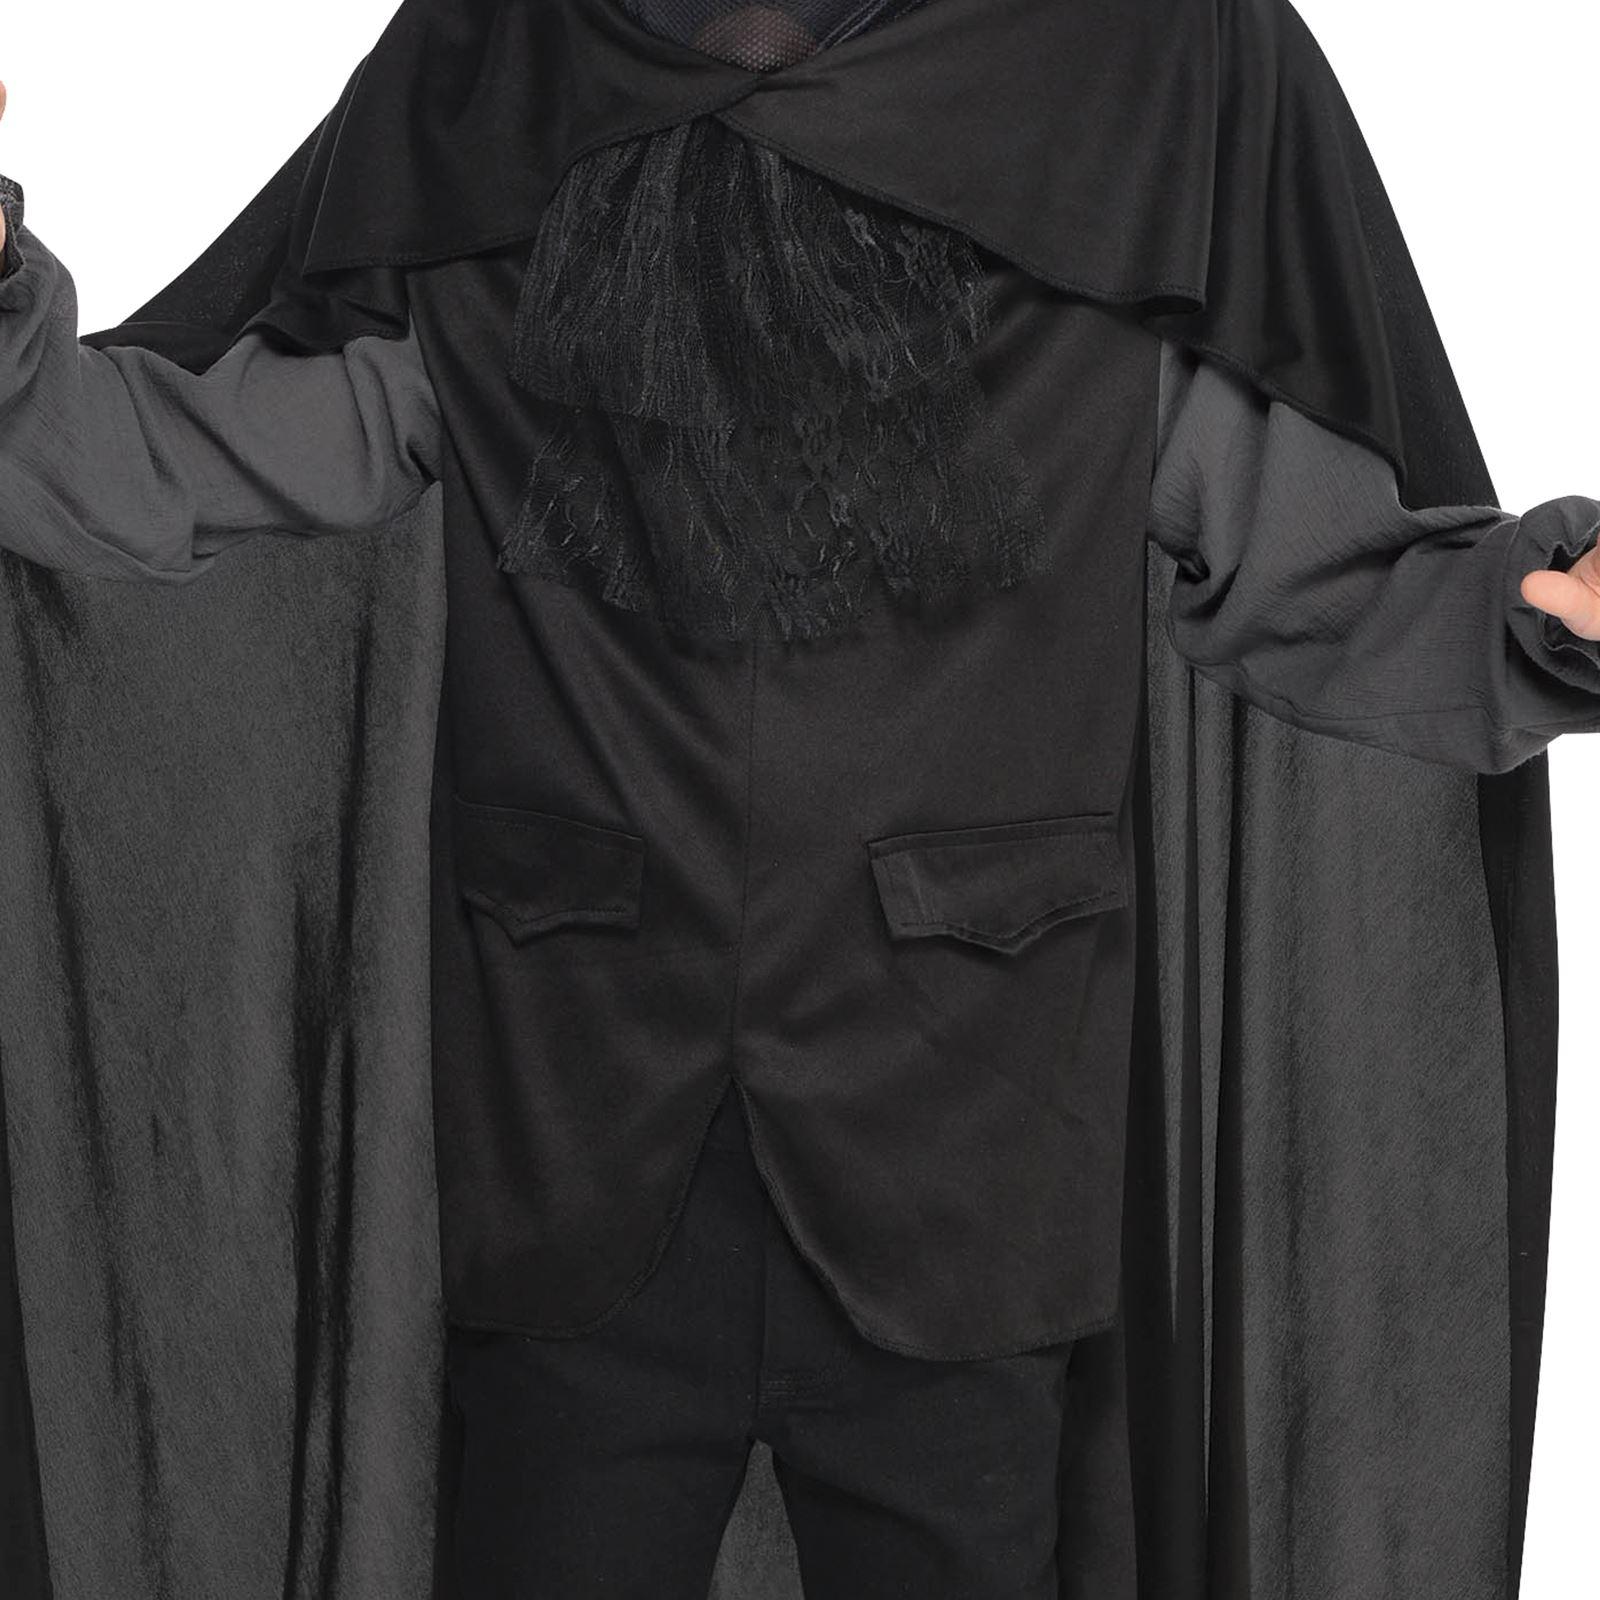 Headless Horseman Man Medieval Ghost Sleepy Horror Halloween Mens Costume